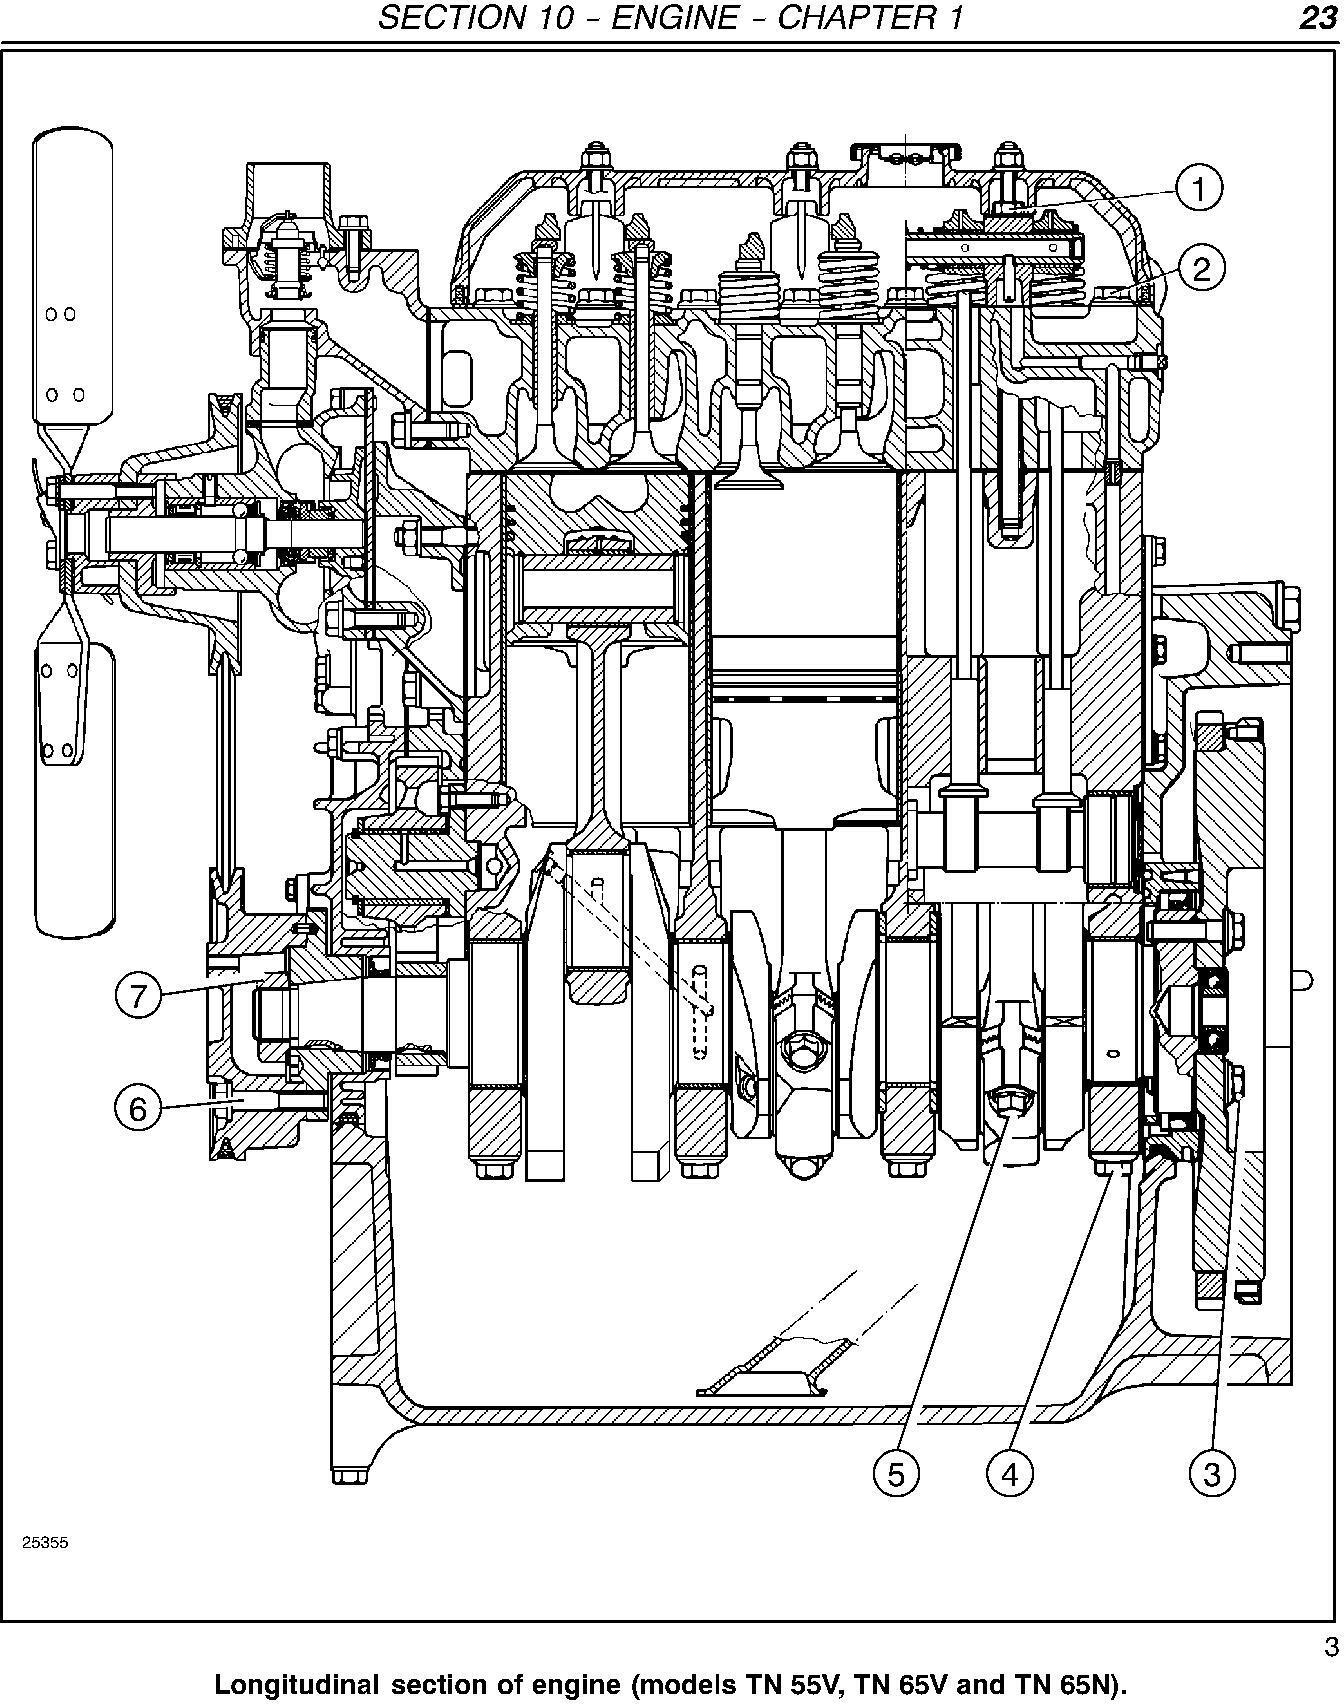 New Holland TN55V, TN65V, TN75V, TN65N, TN75N Tractor Complete Service Manual - 1